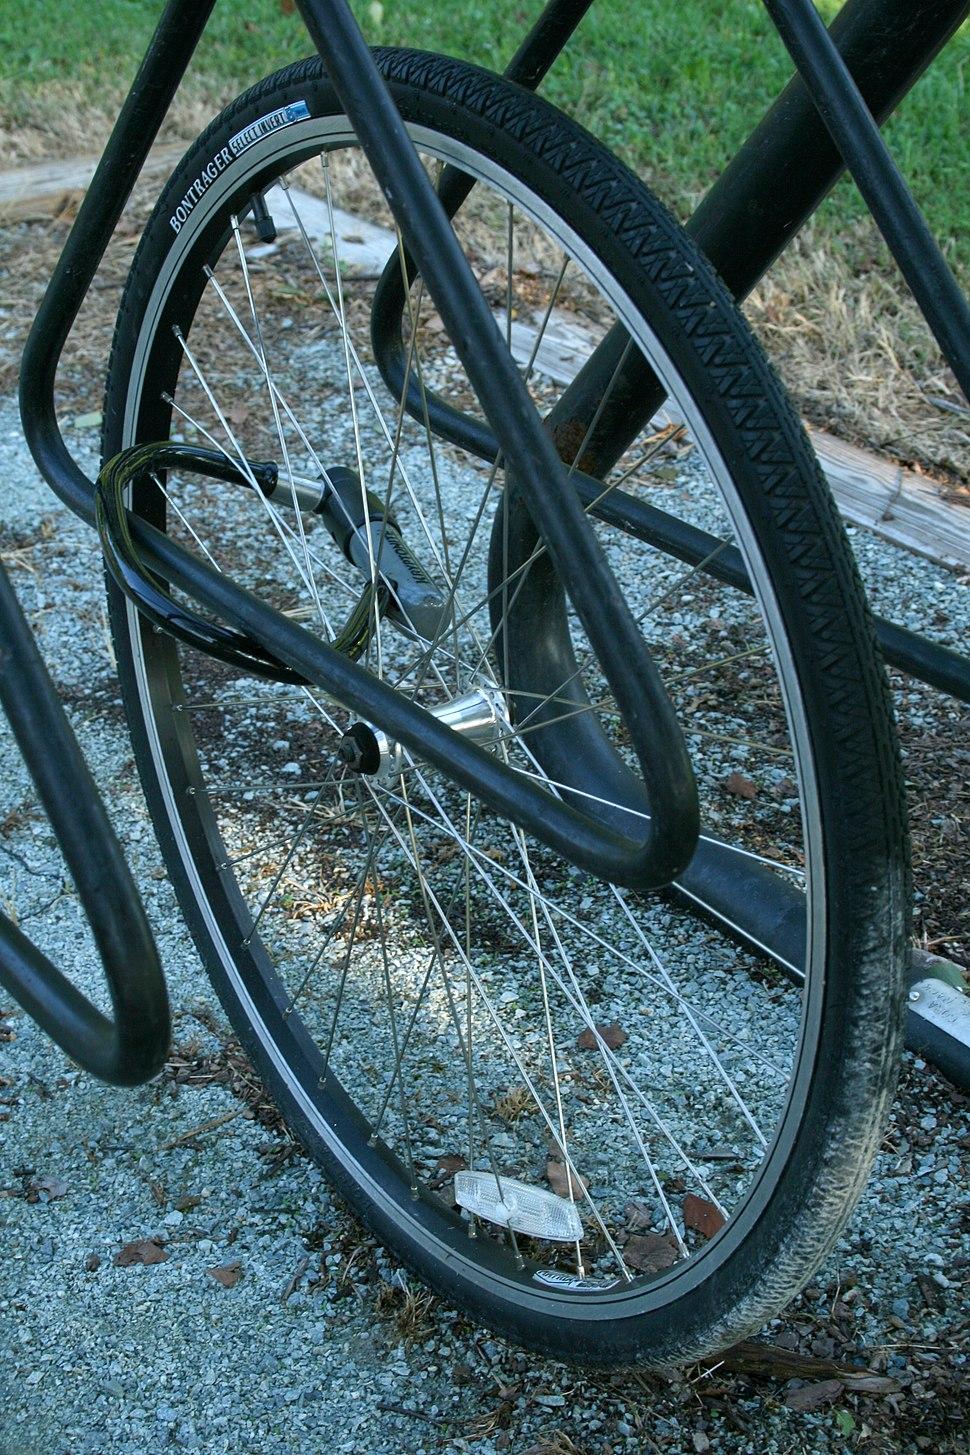 2008-09-06 Solitary bicycle wheel in a bike rack